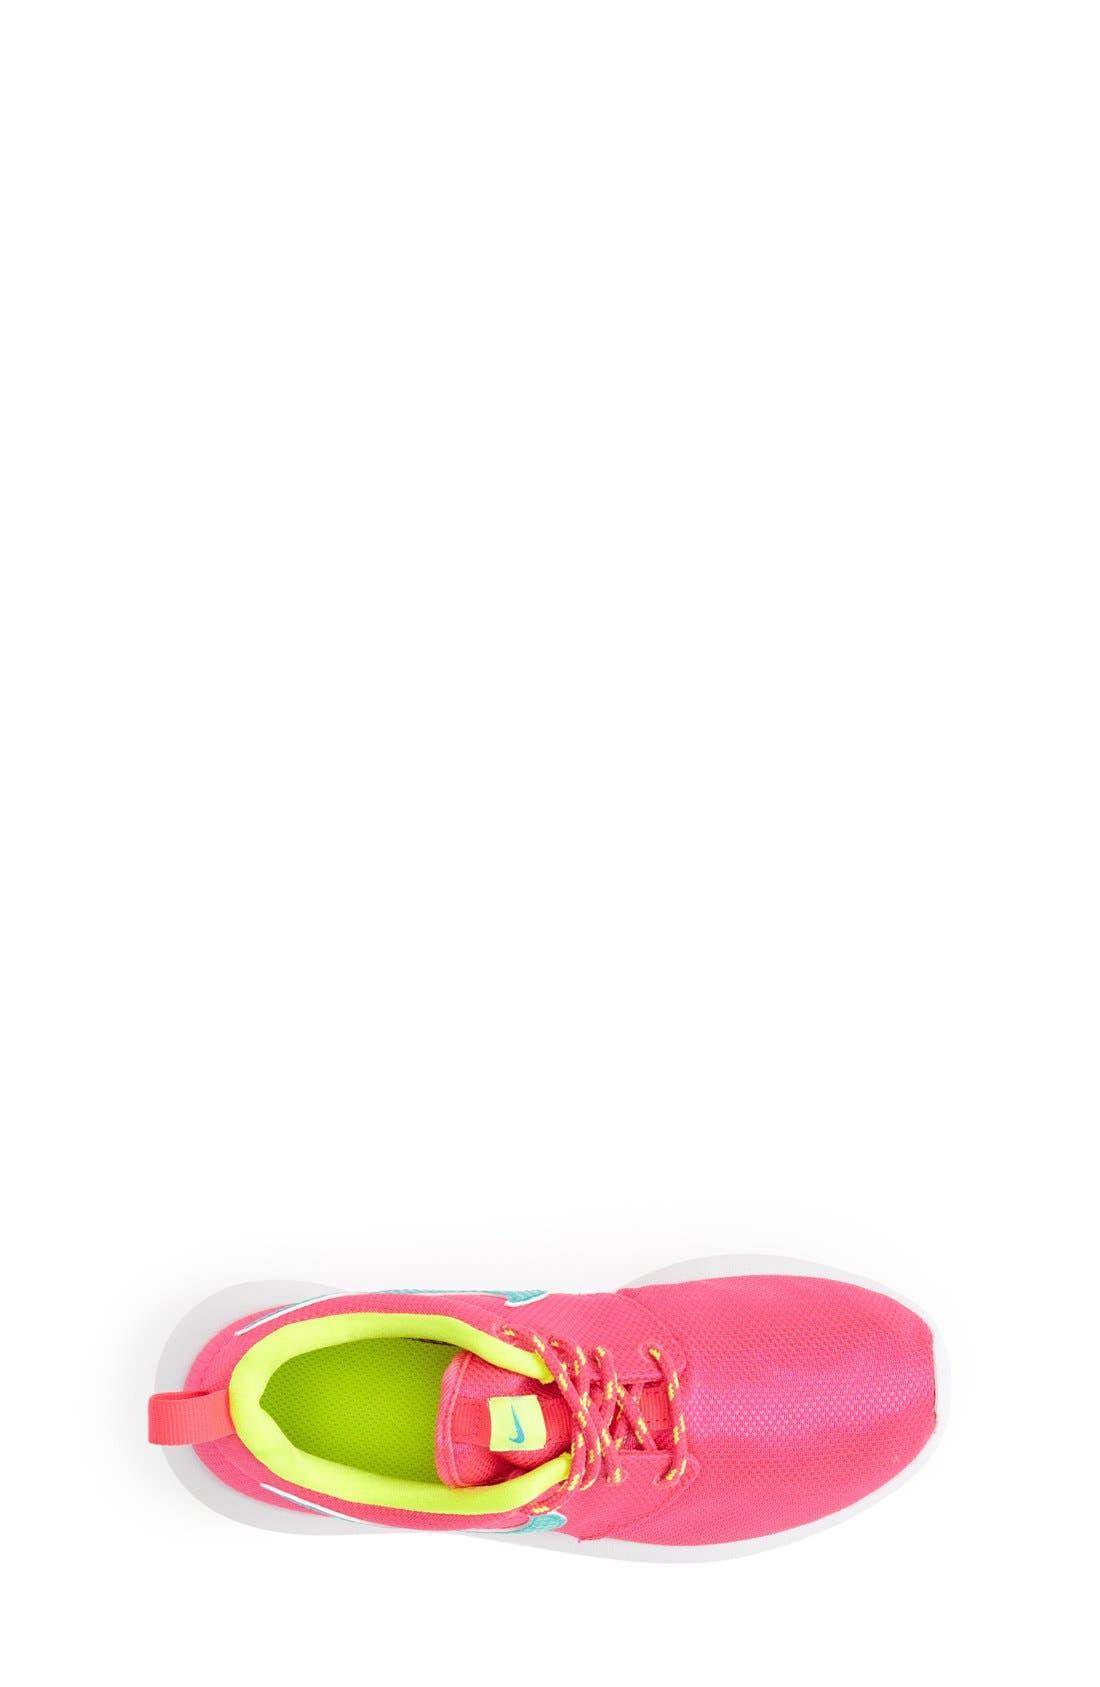 'Roshe Run' Athletic Shoe,                             Alternate thumbnail 177, color,